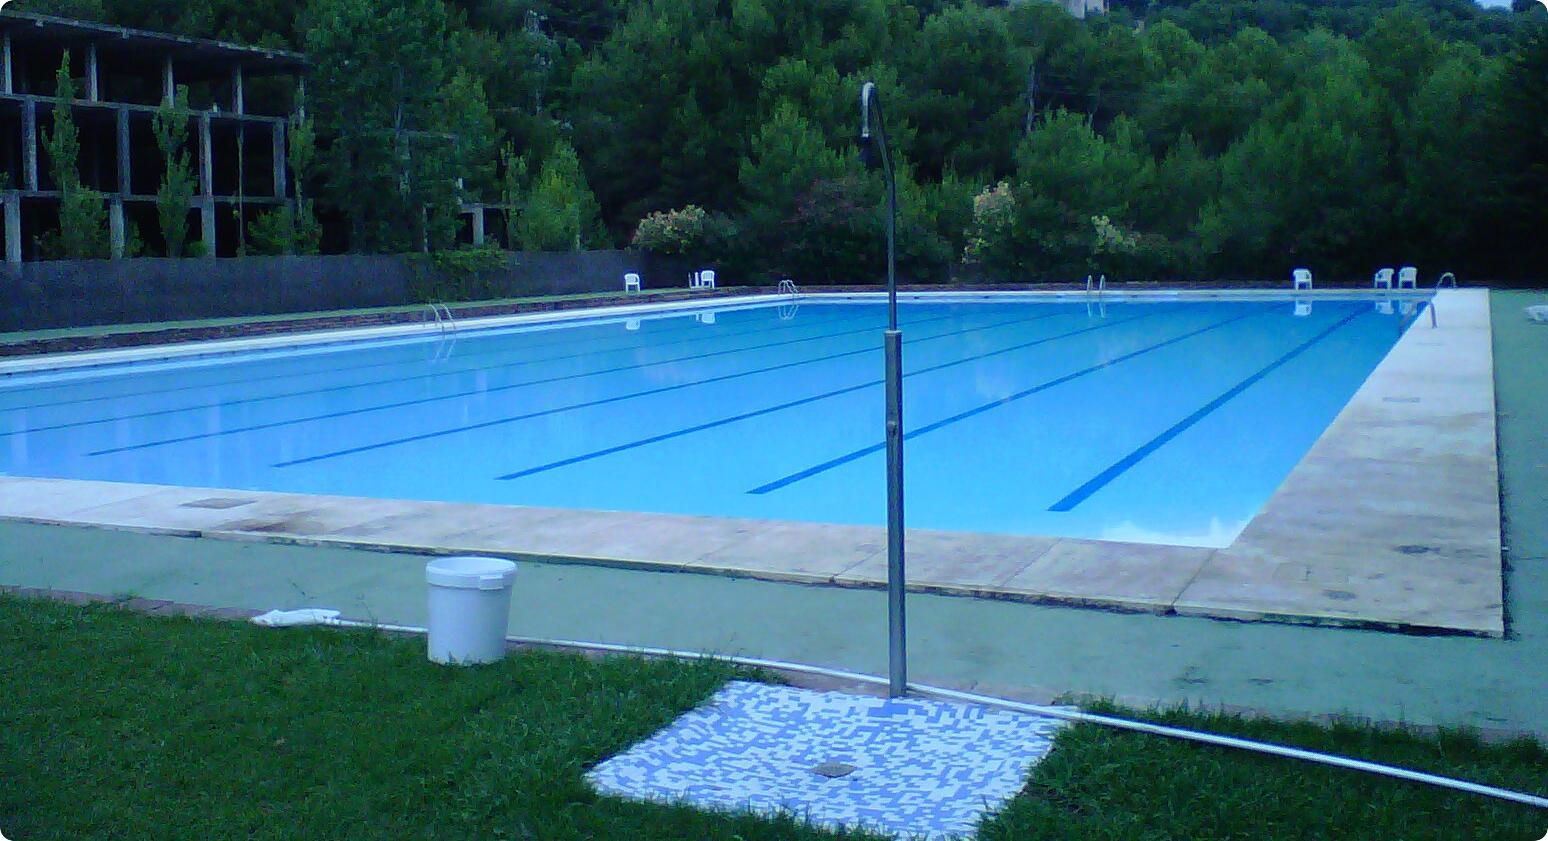 Recubrimientos piscinas rehabilitaciones for Piscina paiporta